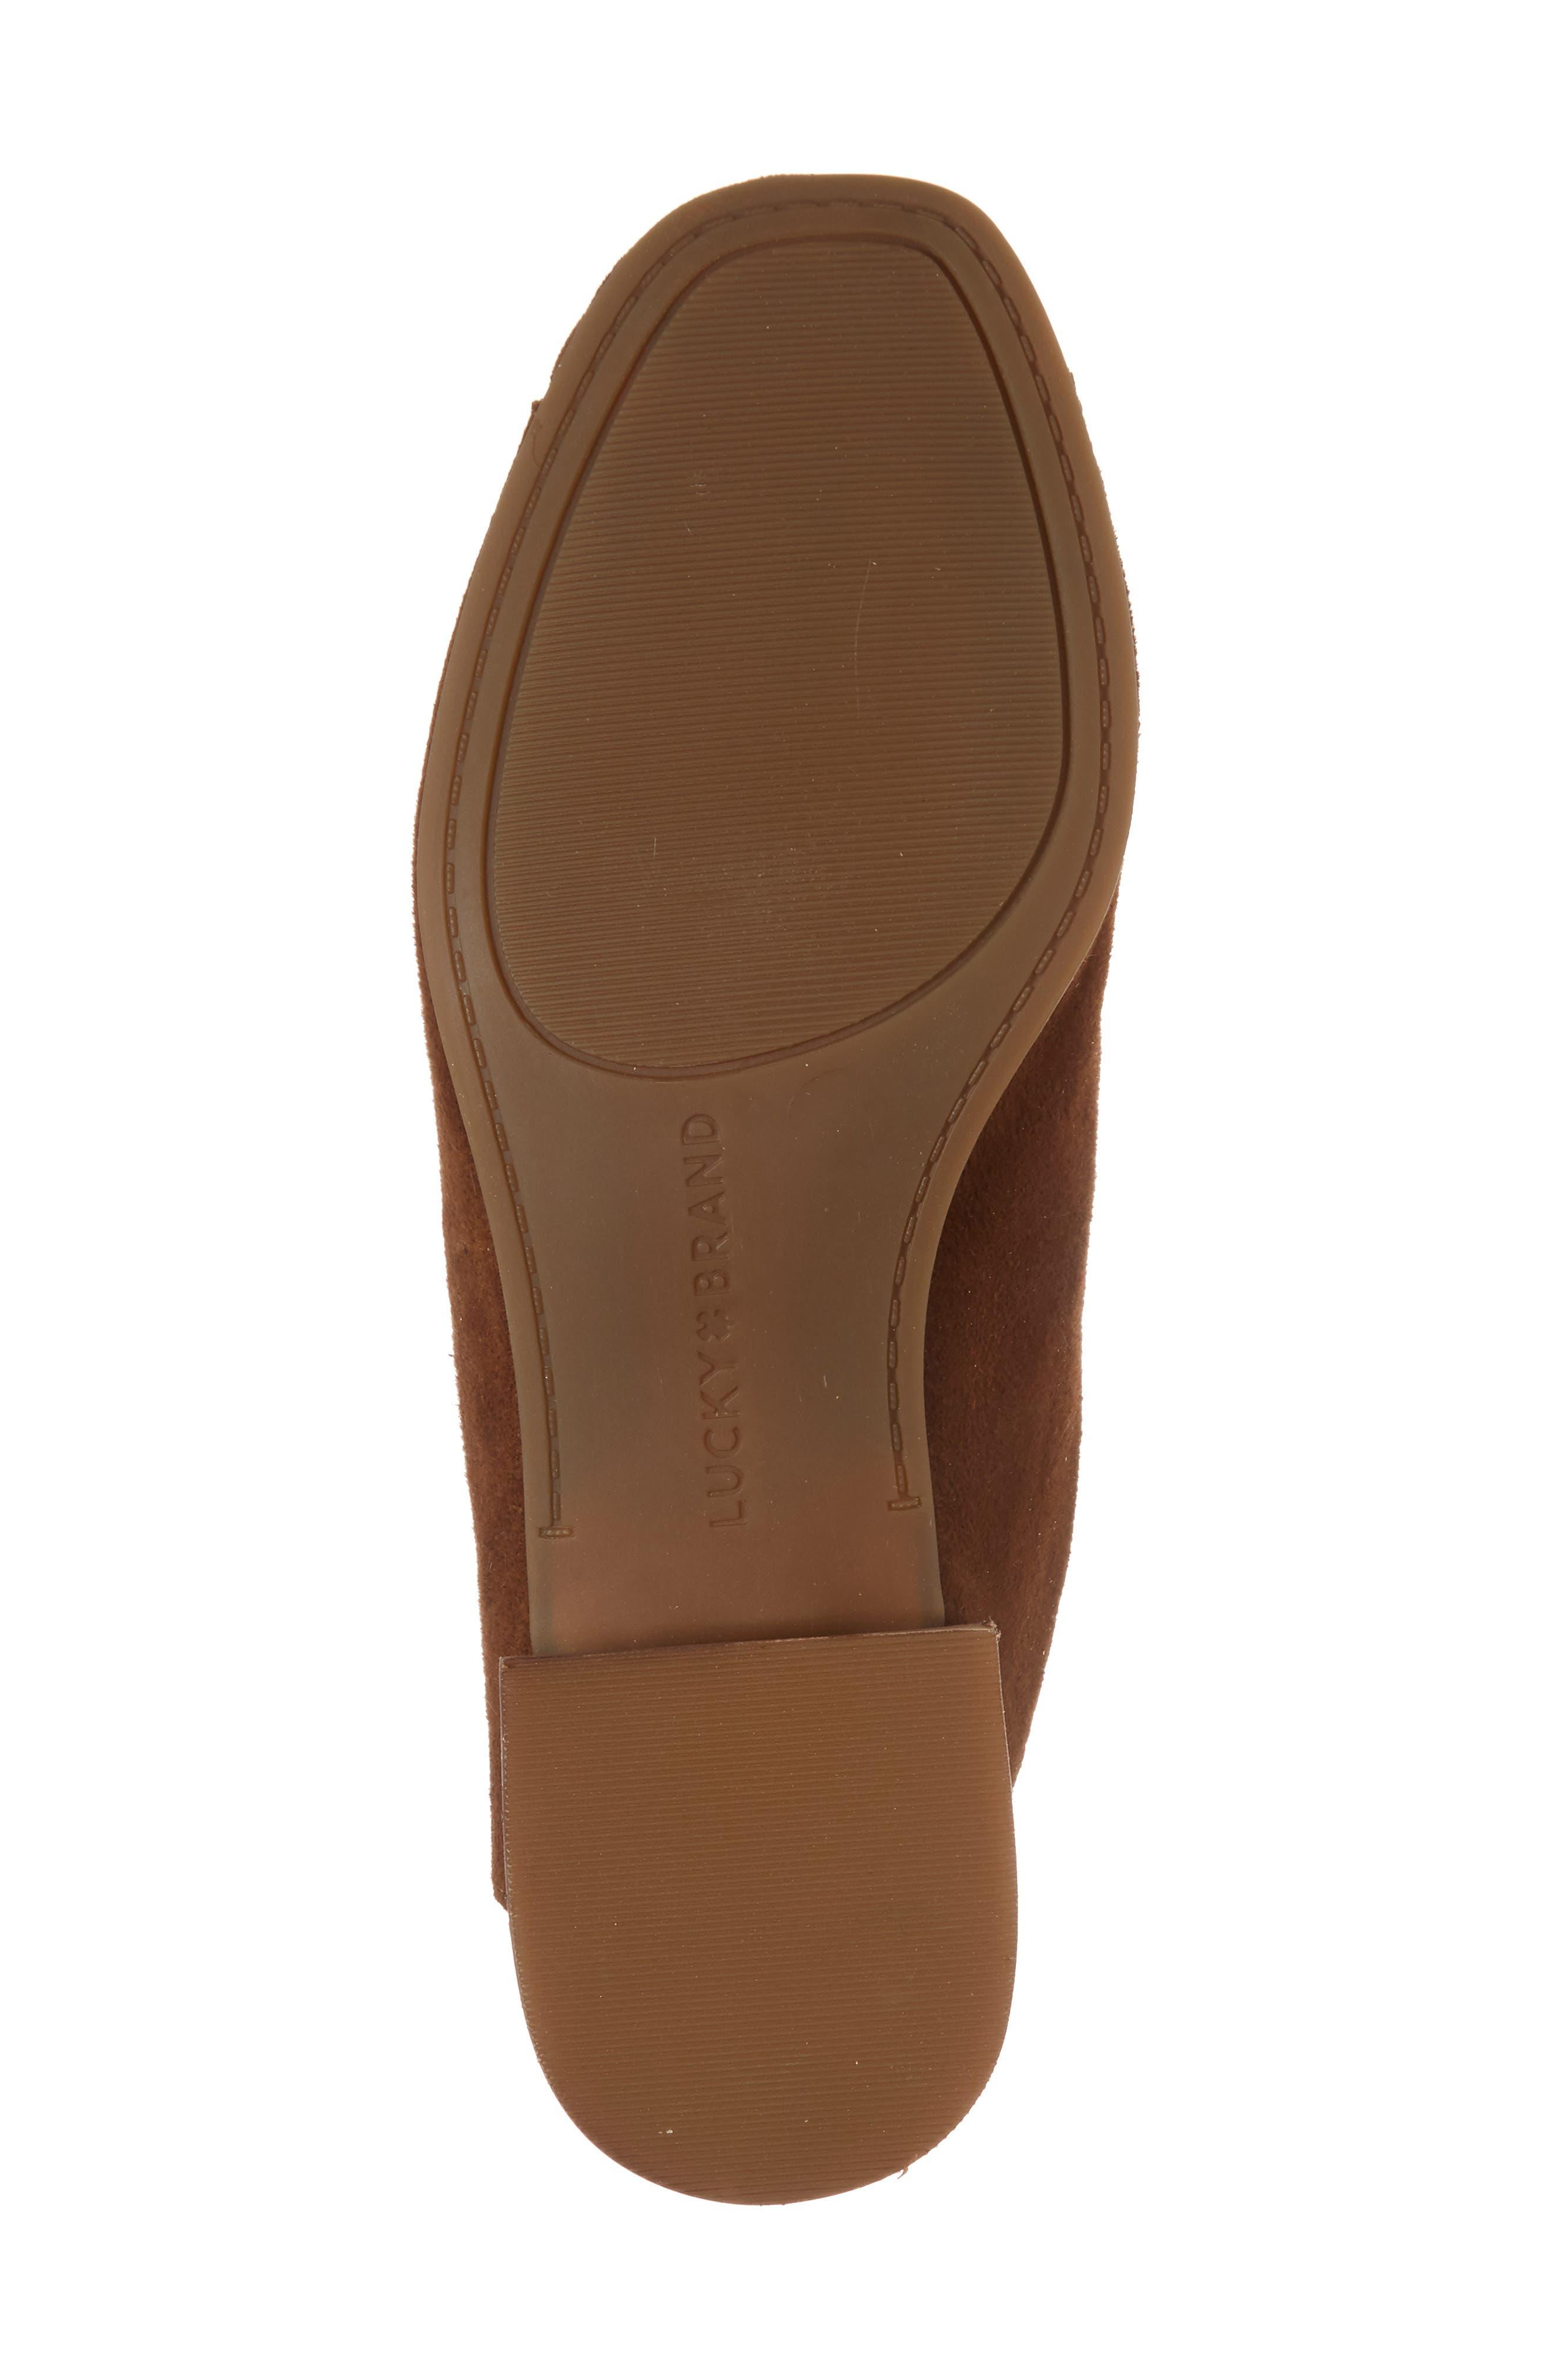 Noomrie Sandal,                             Alternate thumbnail 6, color,                             Cedar Leather